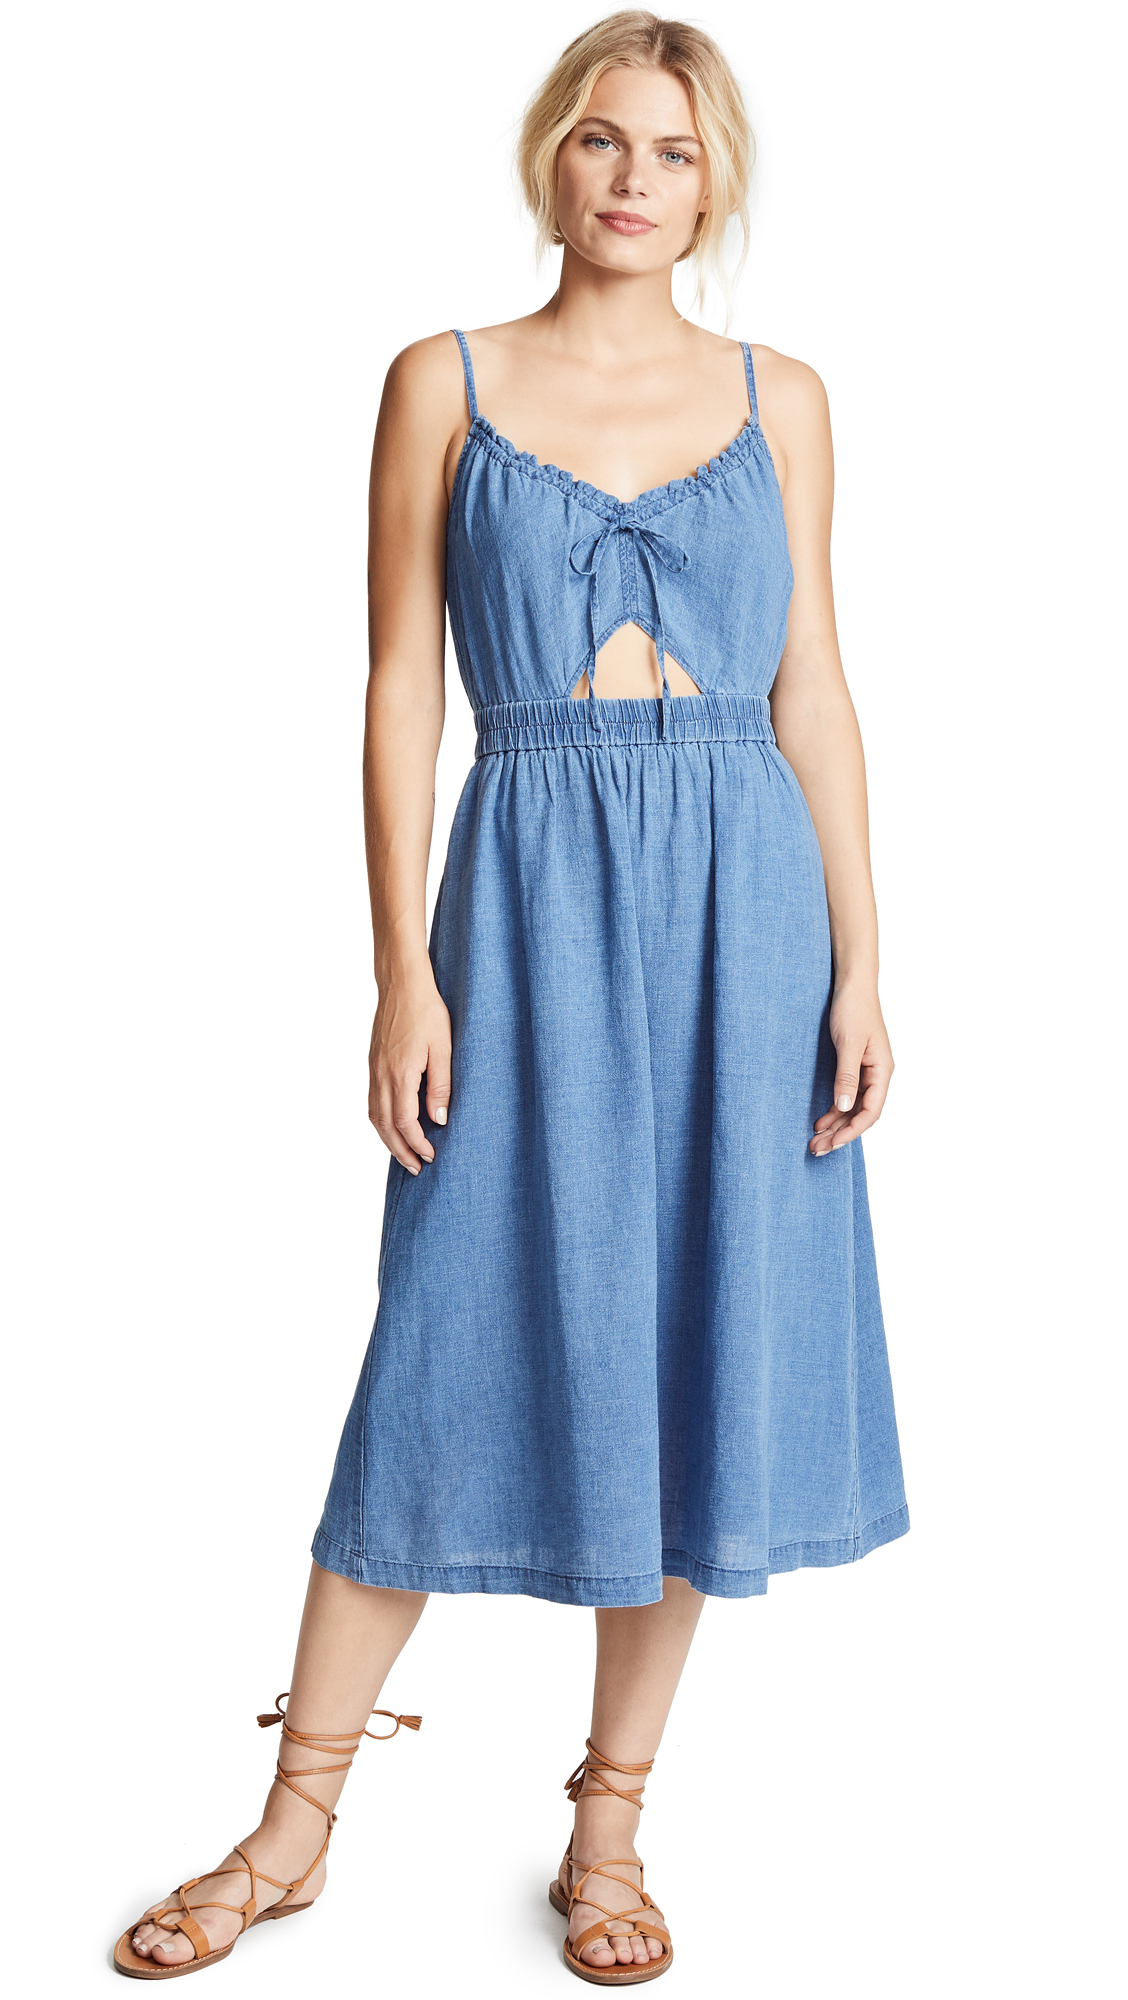 Madewell Indigo Cutout Cami Dress In Alexandra Wash